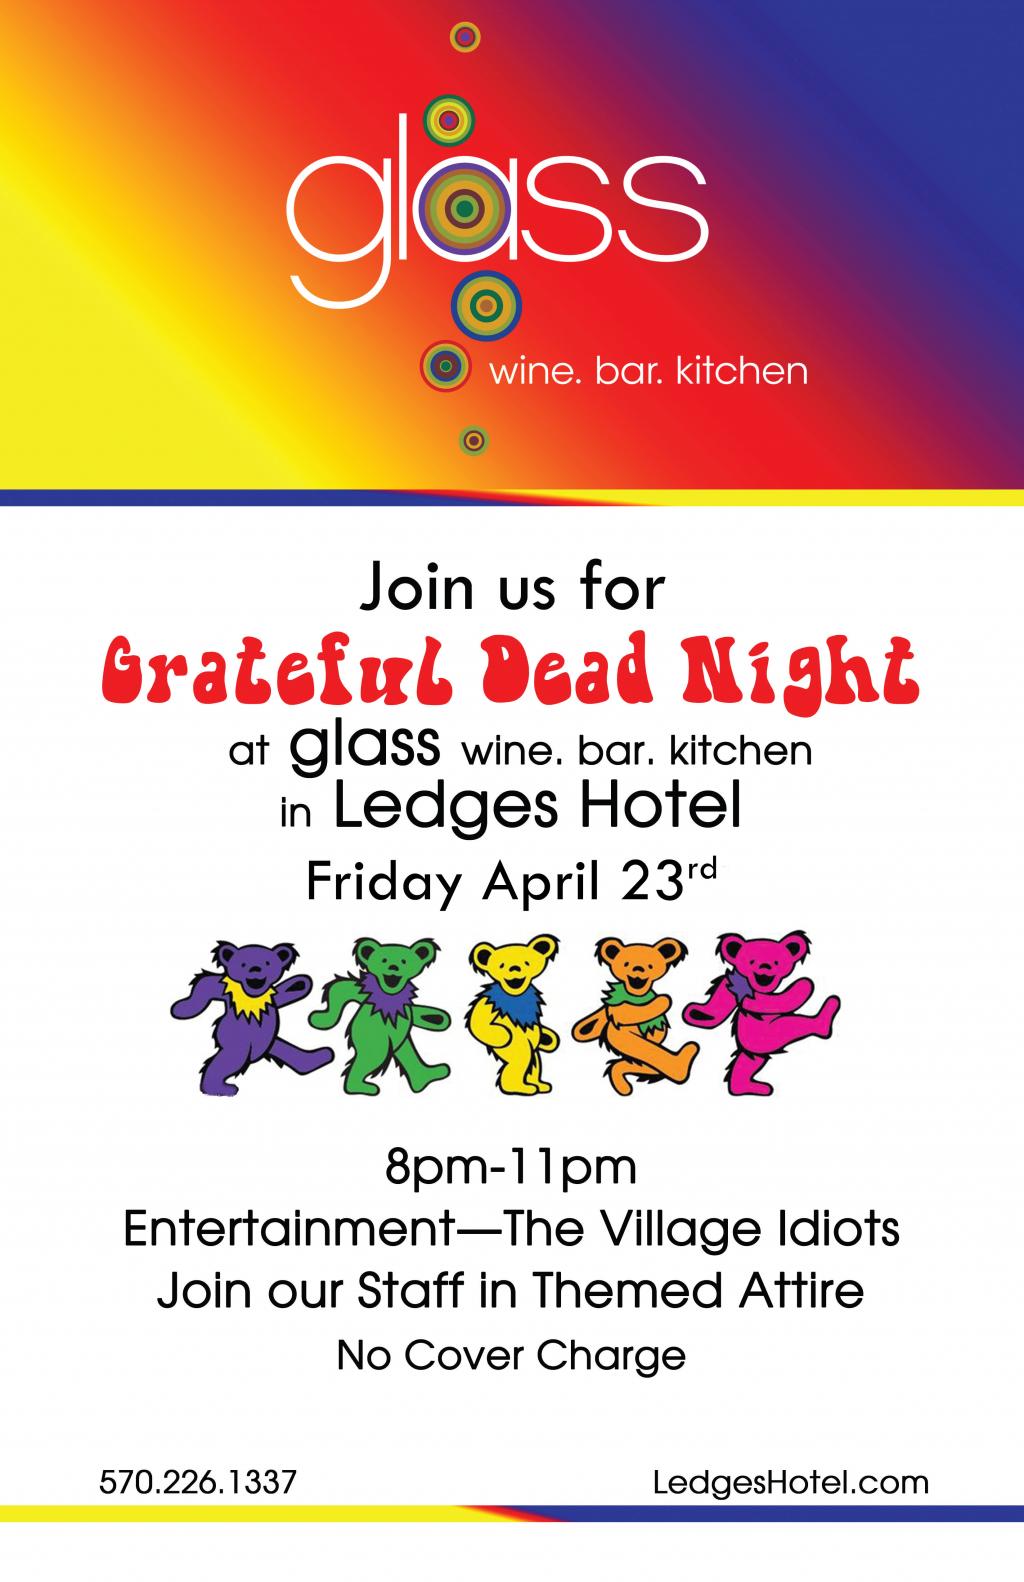 Image for Grateful Dead Night